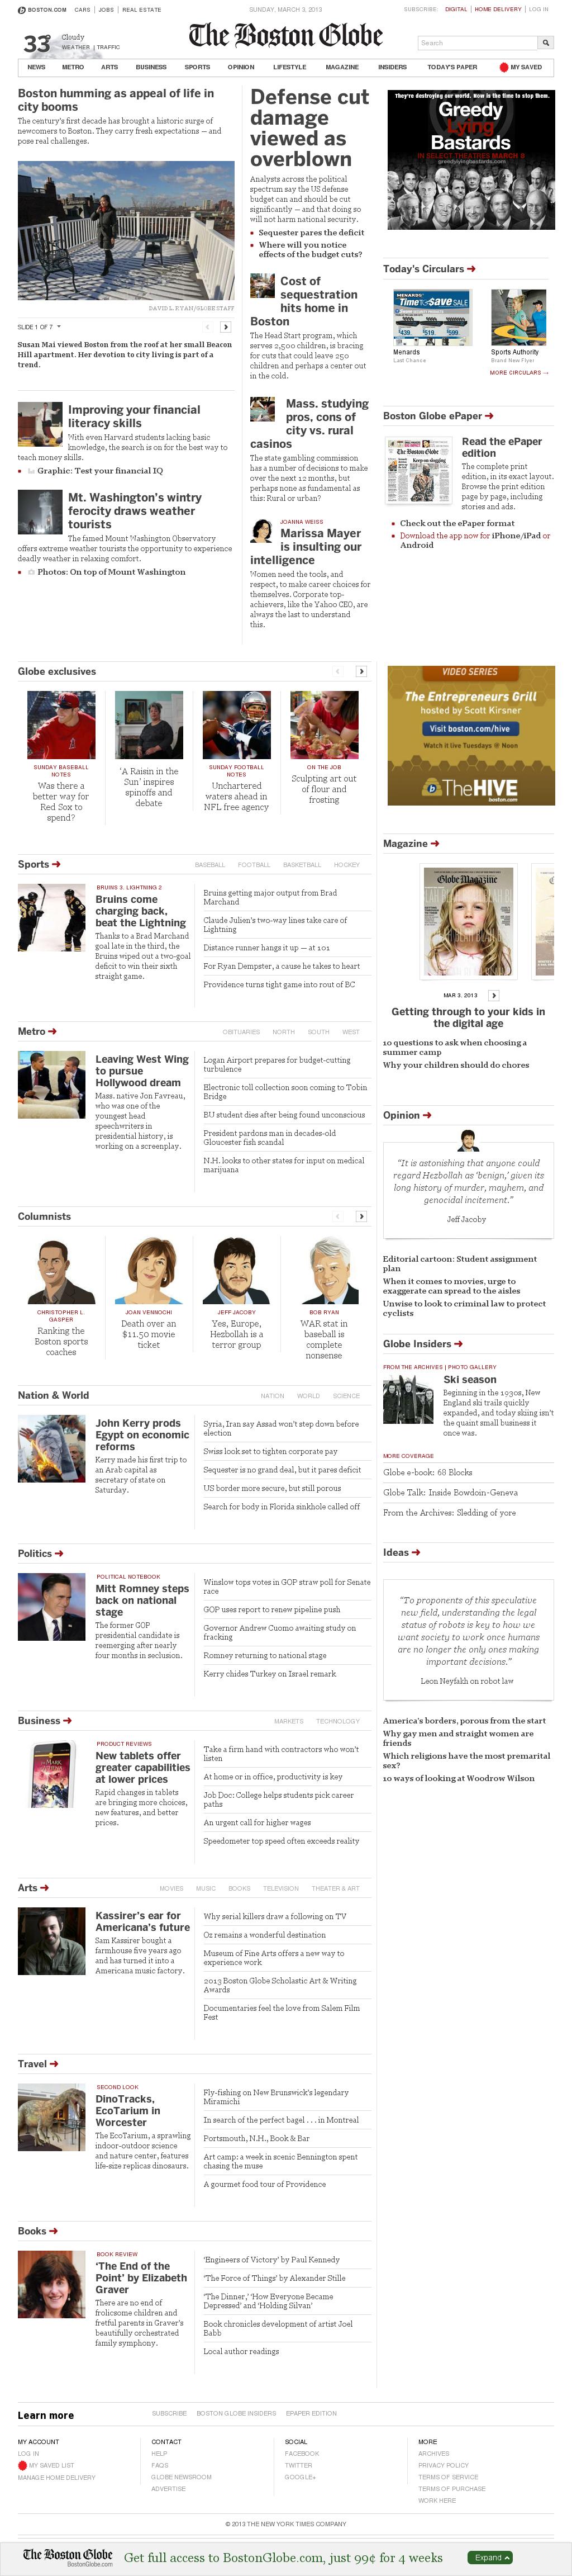 The Boston Globe at Sunday March 3, 2013, 12:01 p.m. UTC